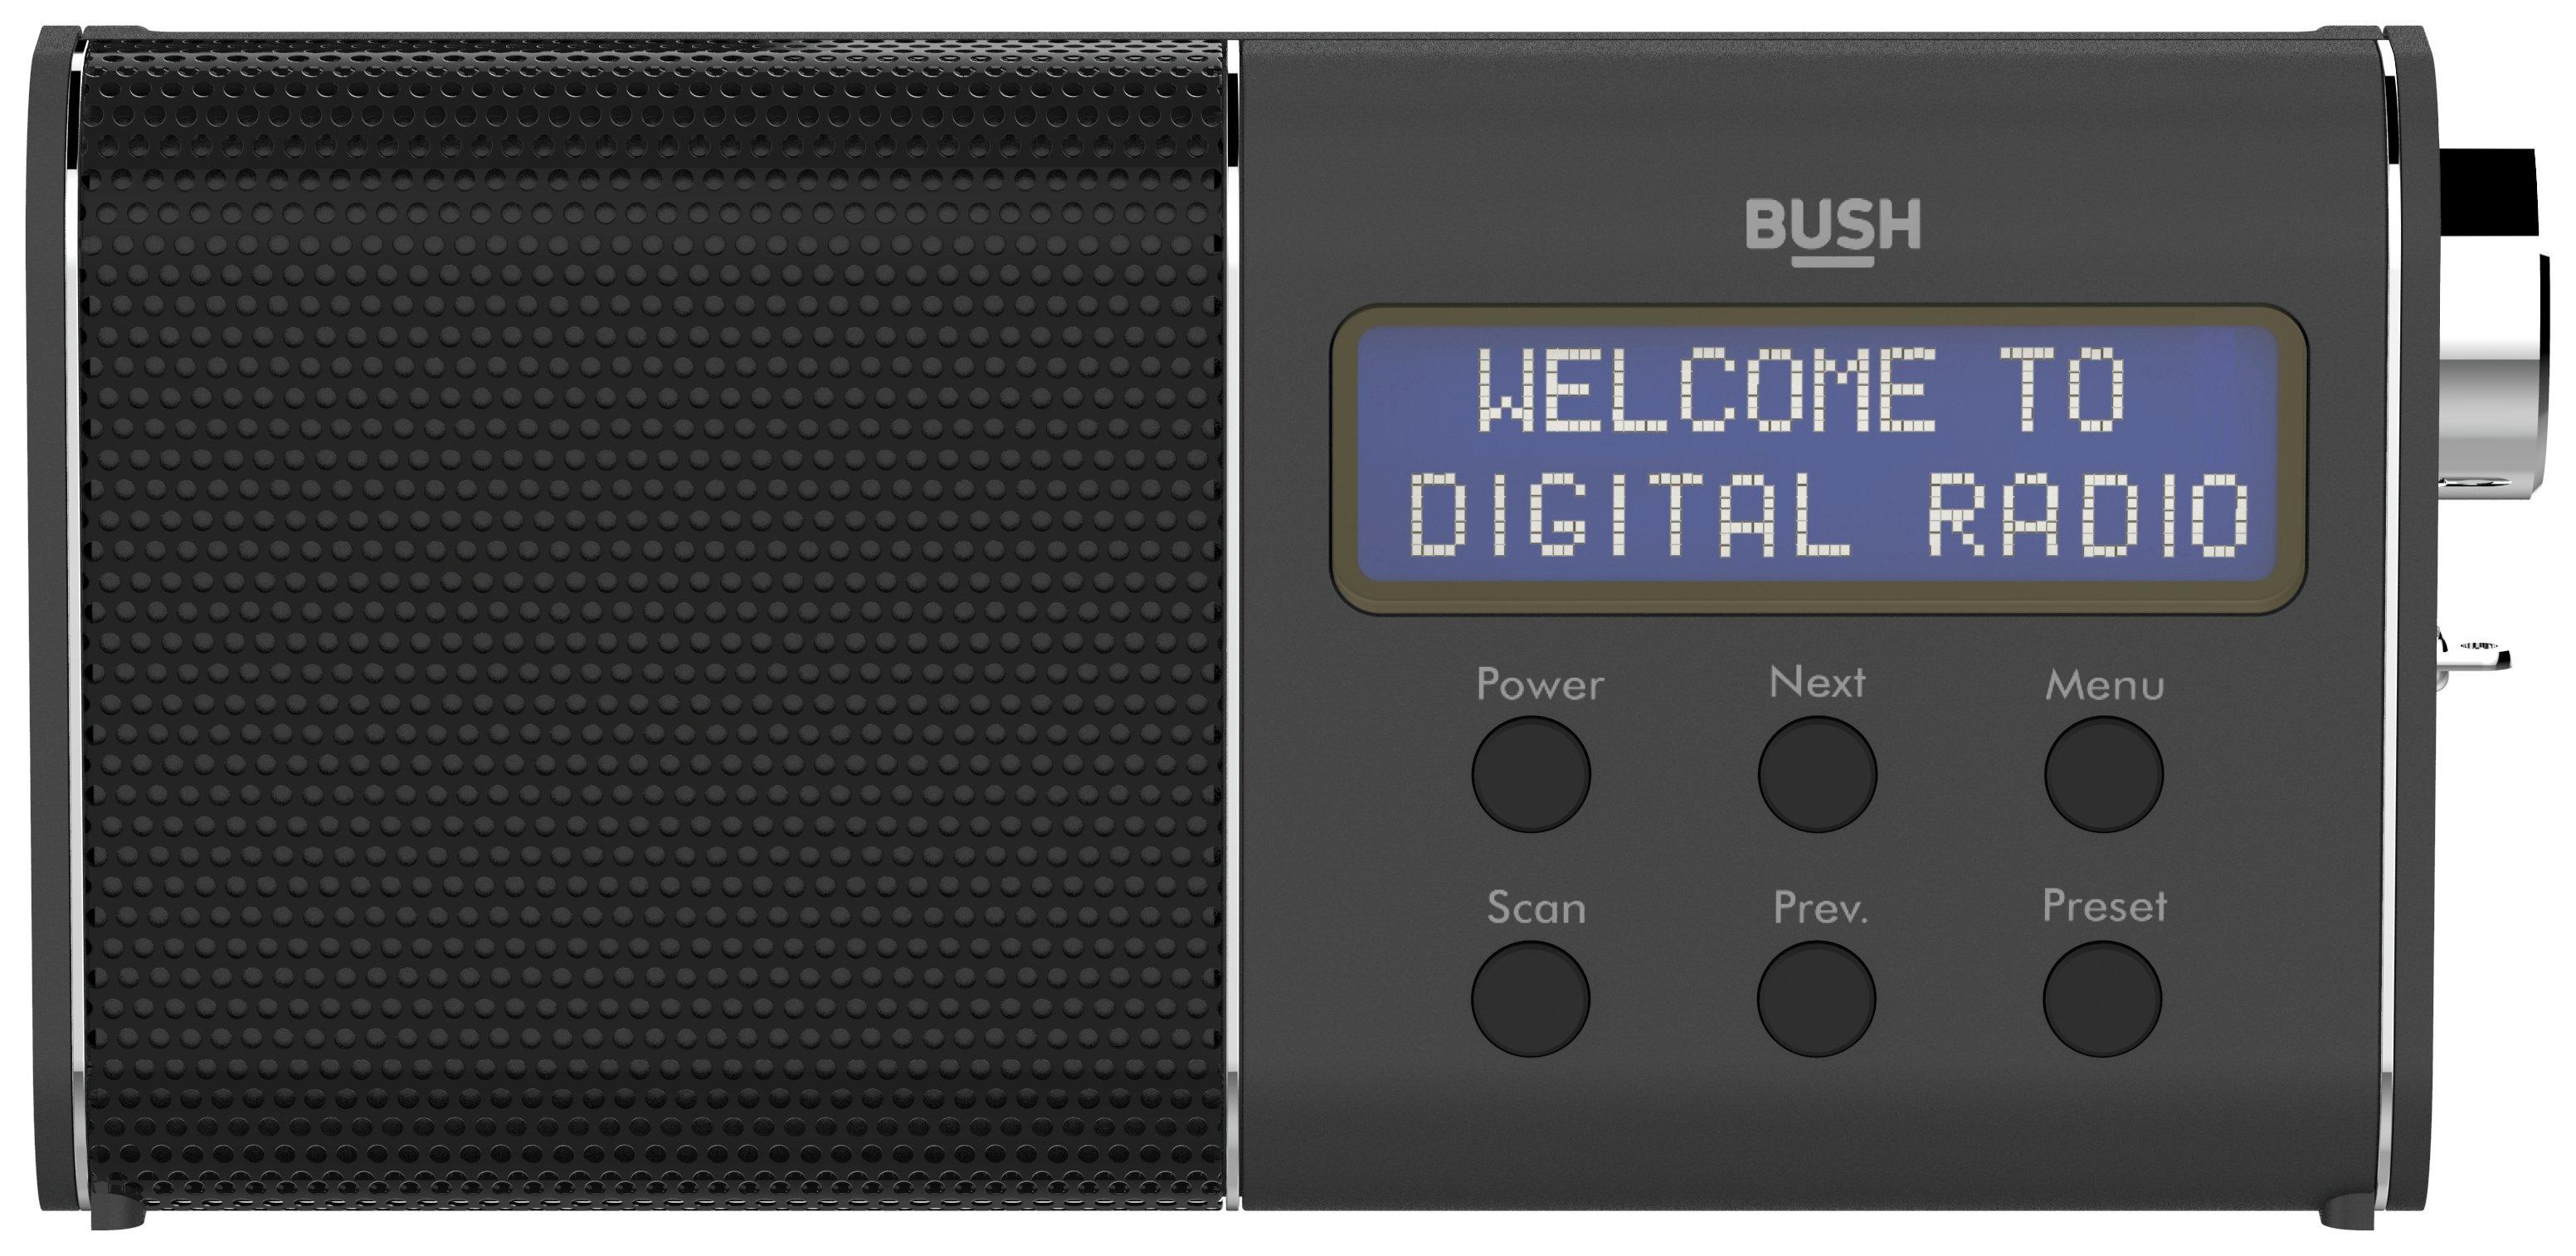 'Bush - Compact Rechargeable Dab/fm Radio - Black